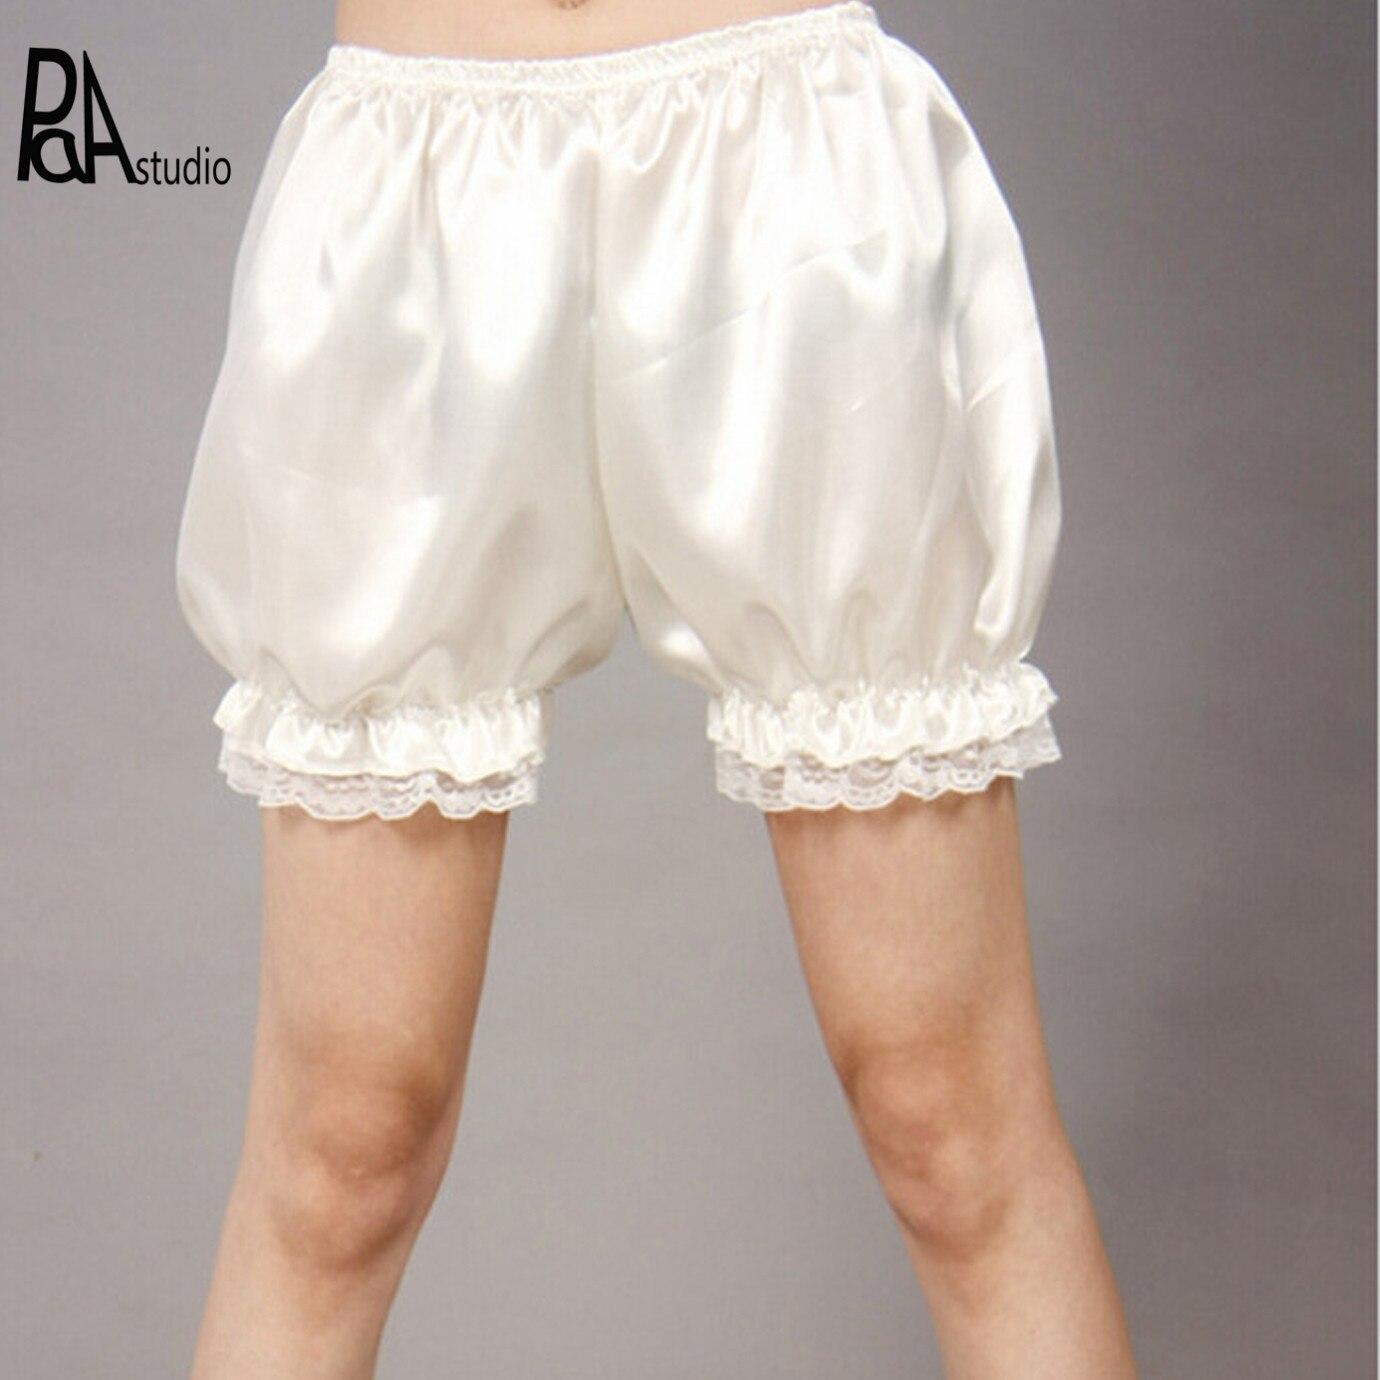 Kawaii Splicing Lace Crochet Ruffles Hem Lolita Satin Silky Silk Pumpkin Bloomers Shorts Sleepwear Under Pants Safety Shorts Шорты